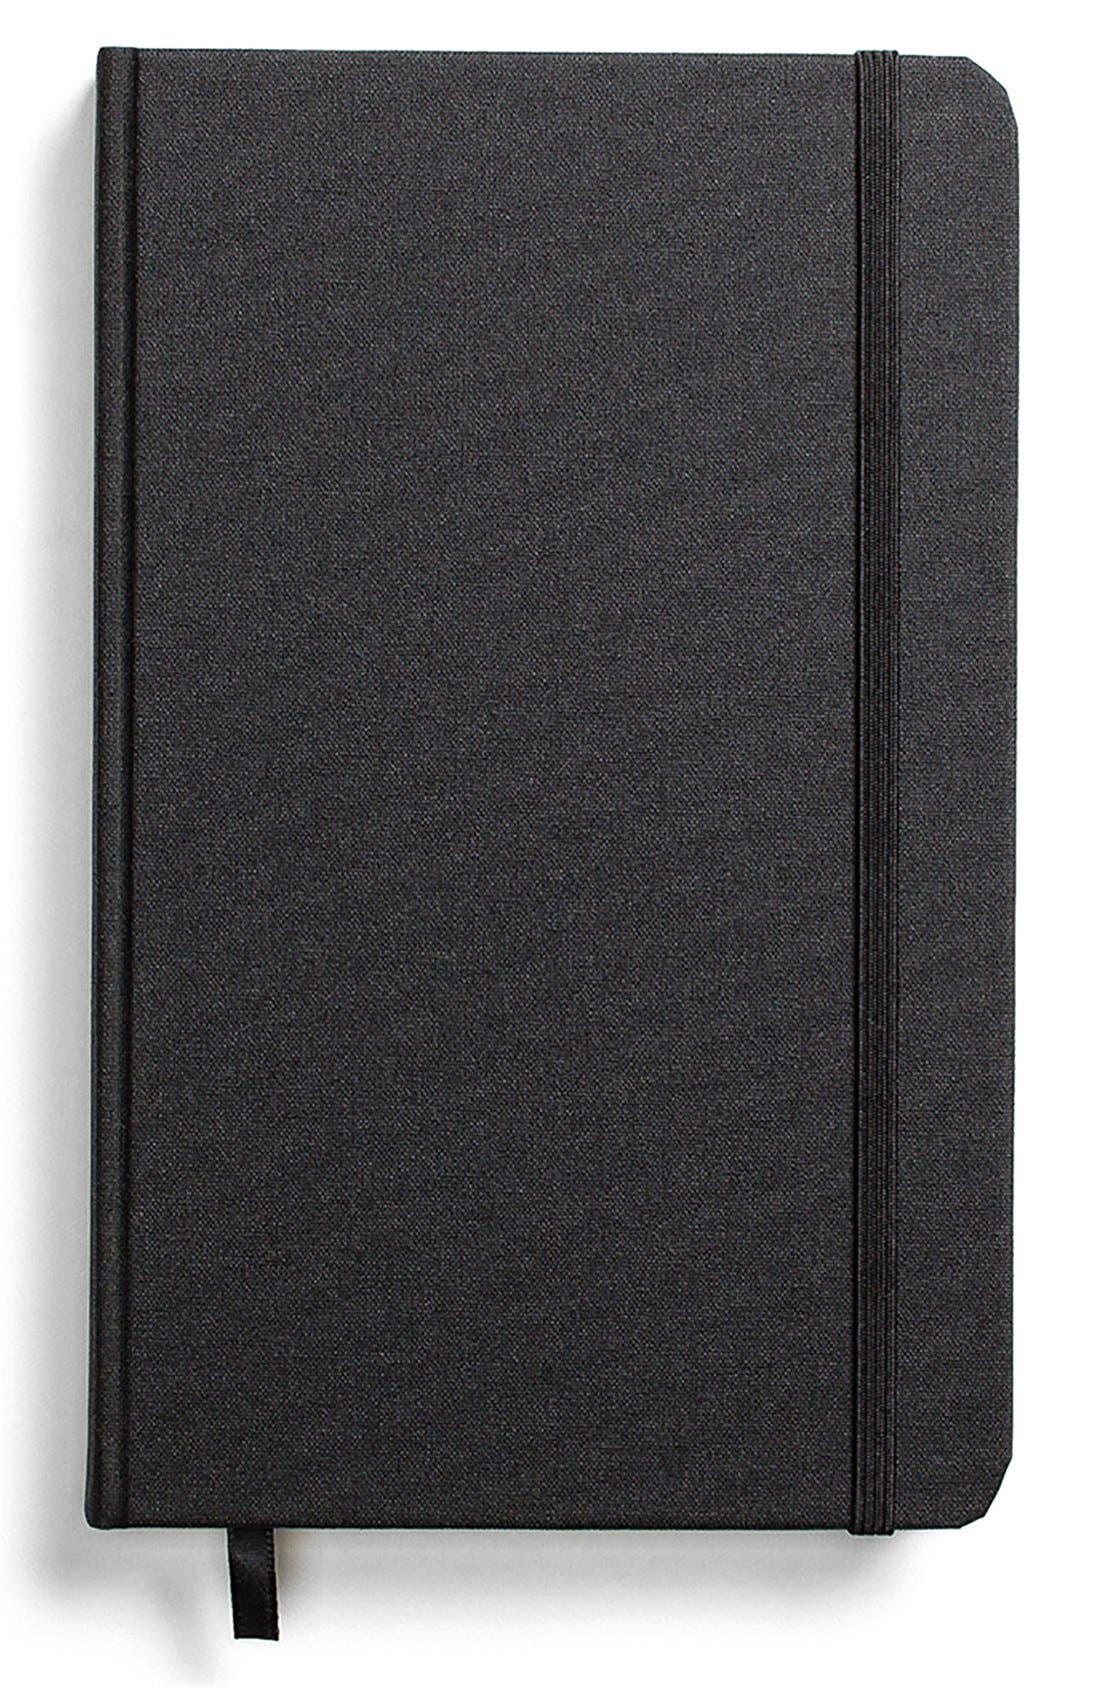 SHINOLA Hardcover Linen Journal